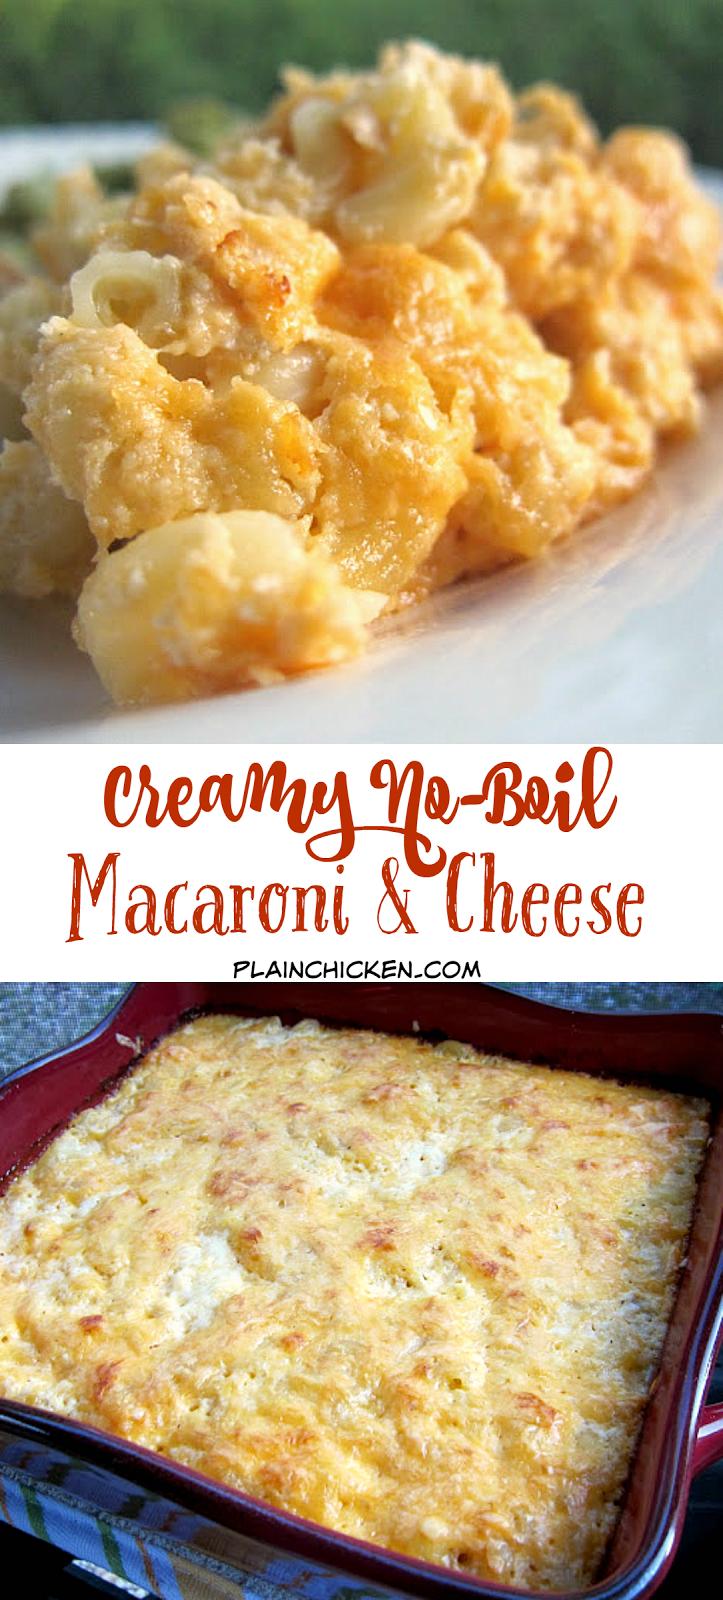 Creamy No Boil Macaroni And Cheese   Cottage Cheese, Milk, Dijon Mustard,